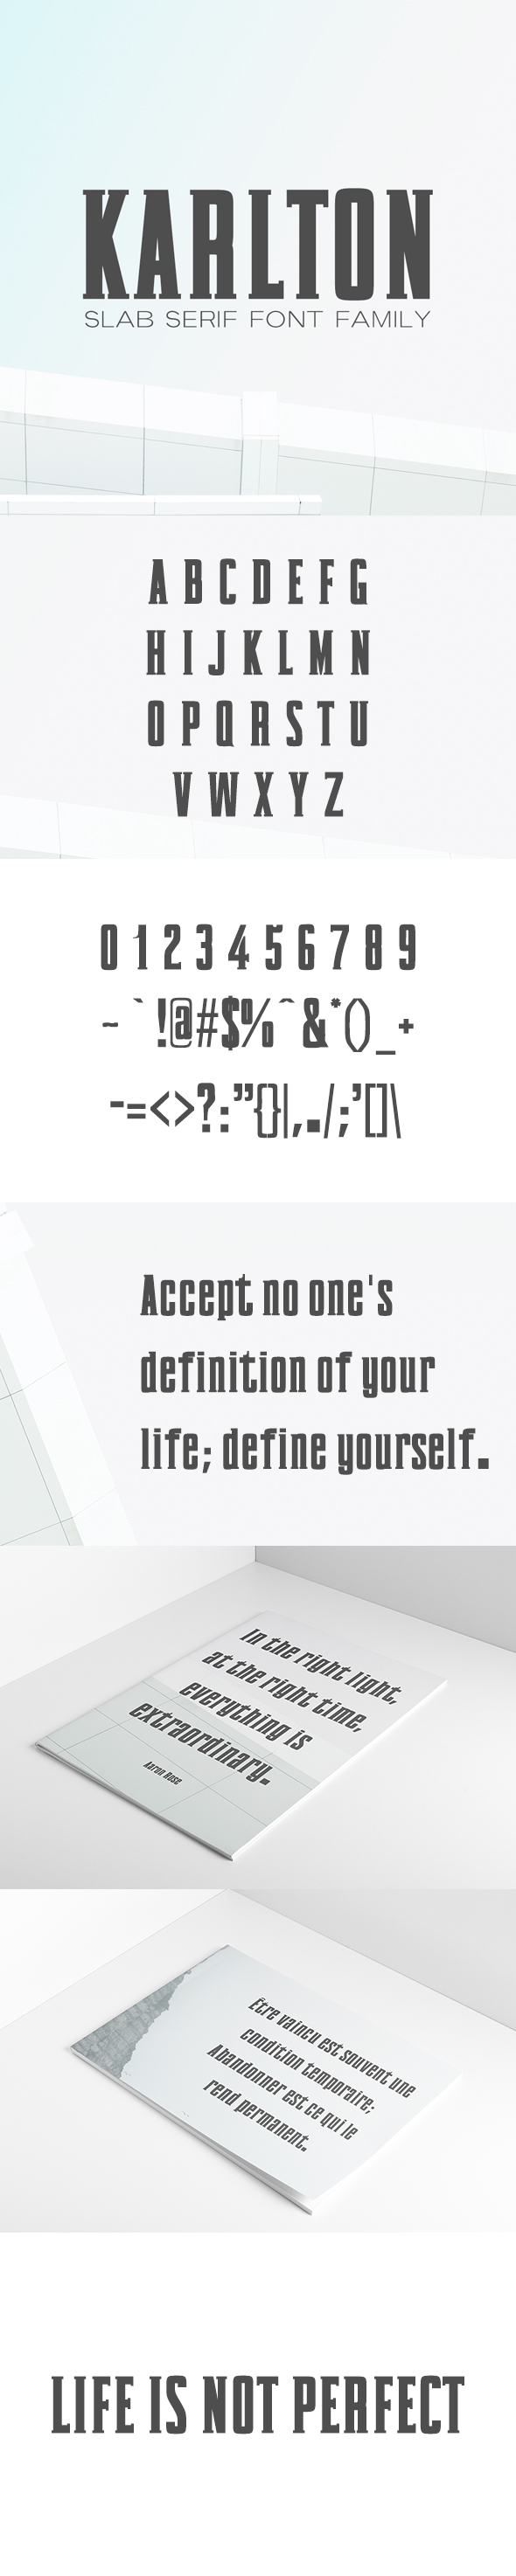 Karlton Slab Serif Font Family - Sans-Serif Fonts